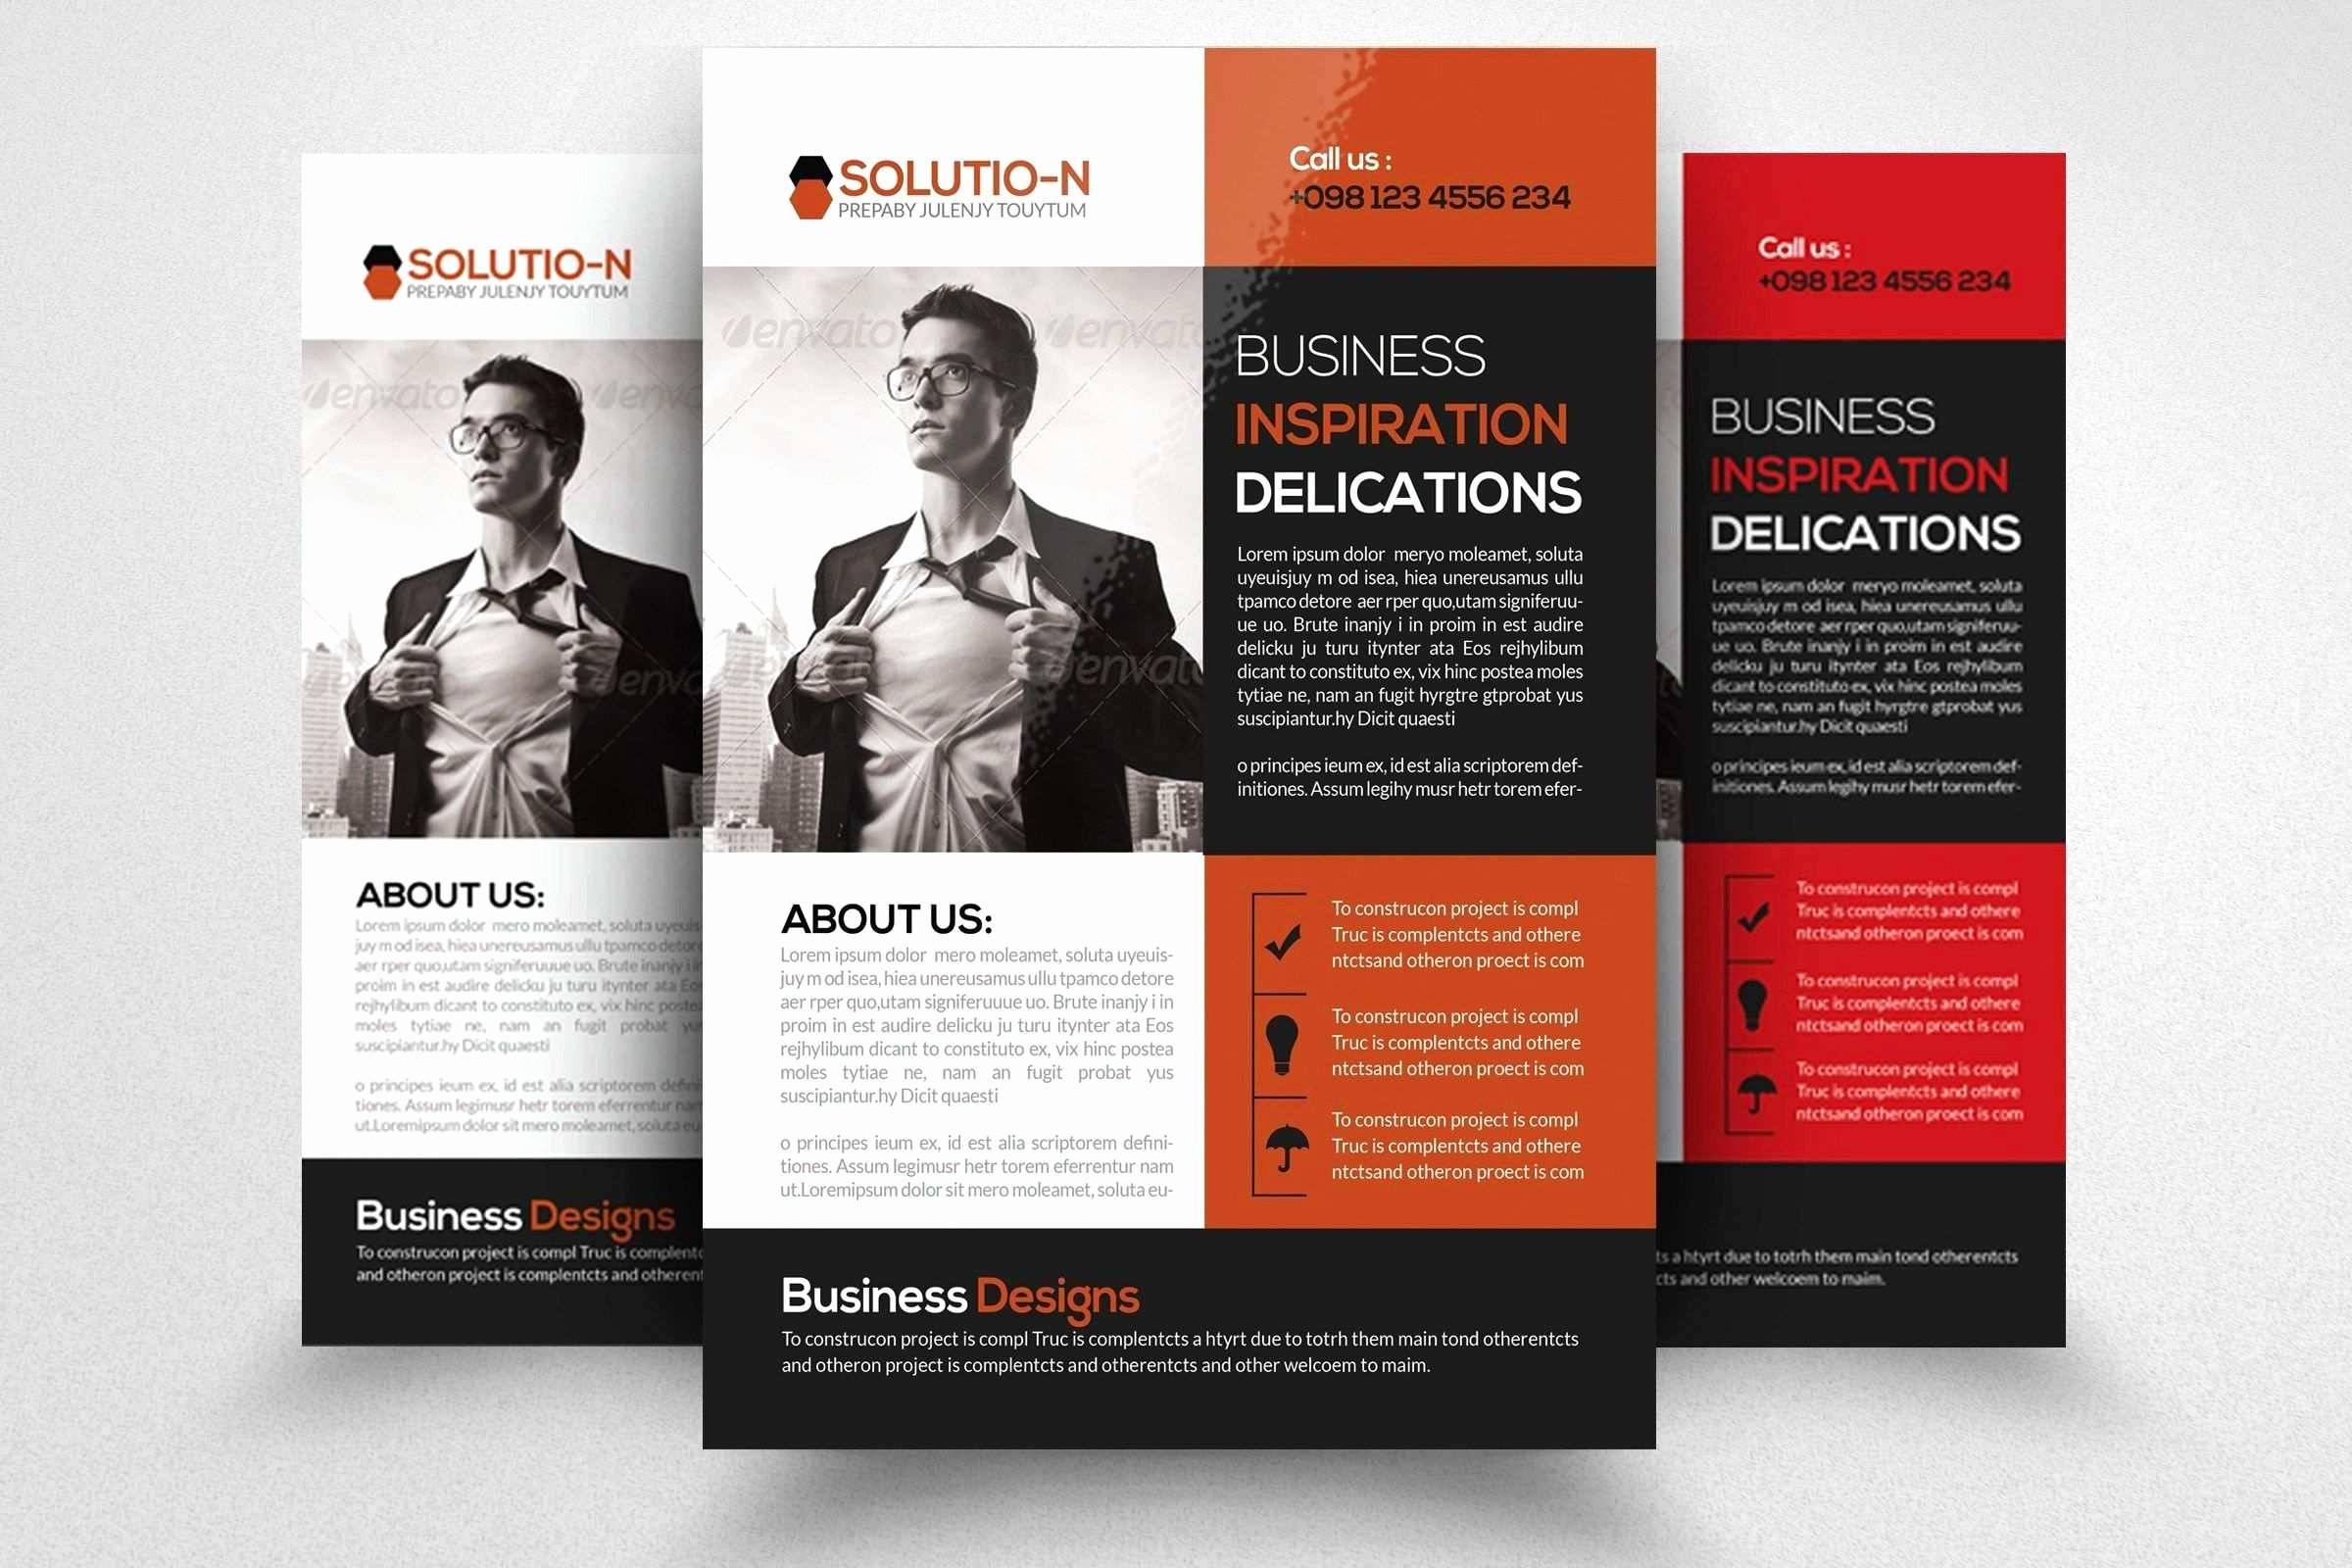 Medical Brochure Design Templates Free Download